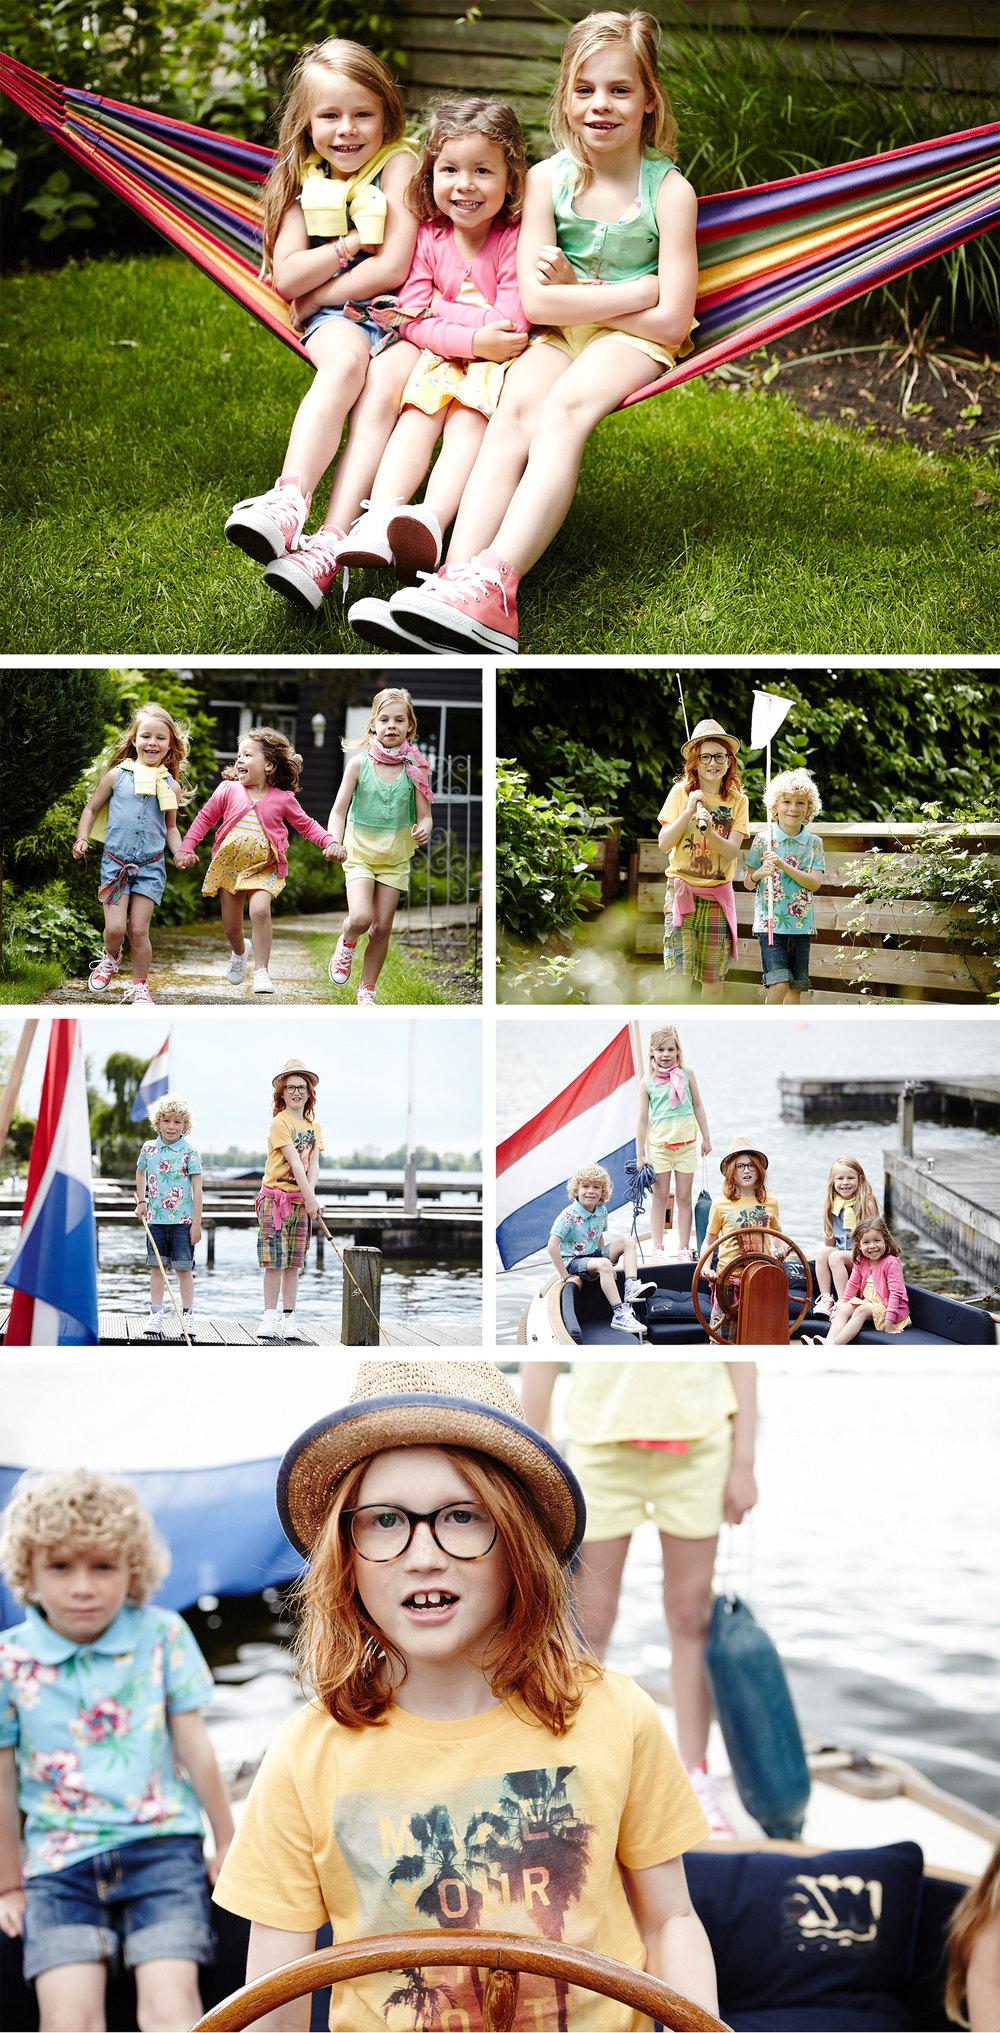 collectie-zomer-2014-tommy-hilfiger-dirk-kikstra-carole-minnema.jpg